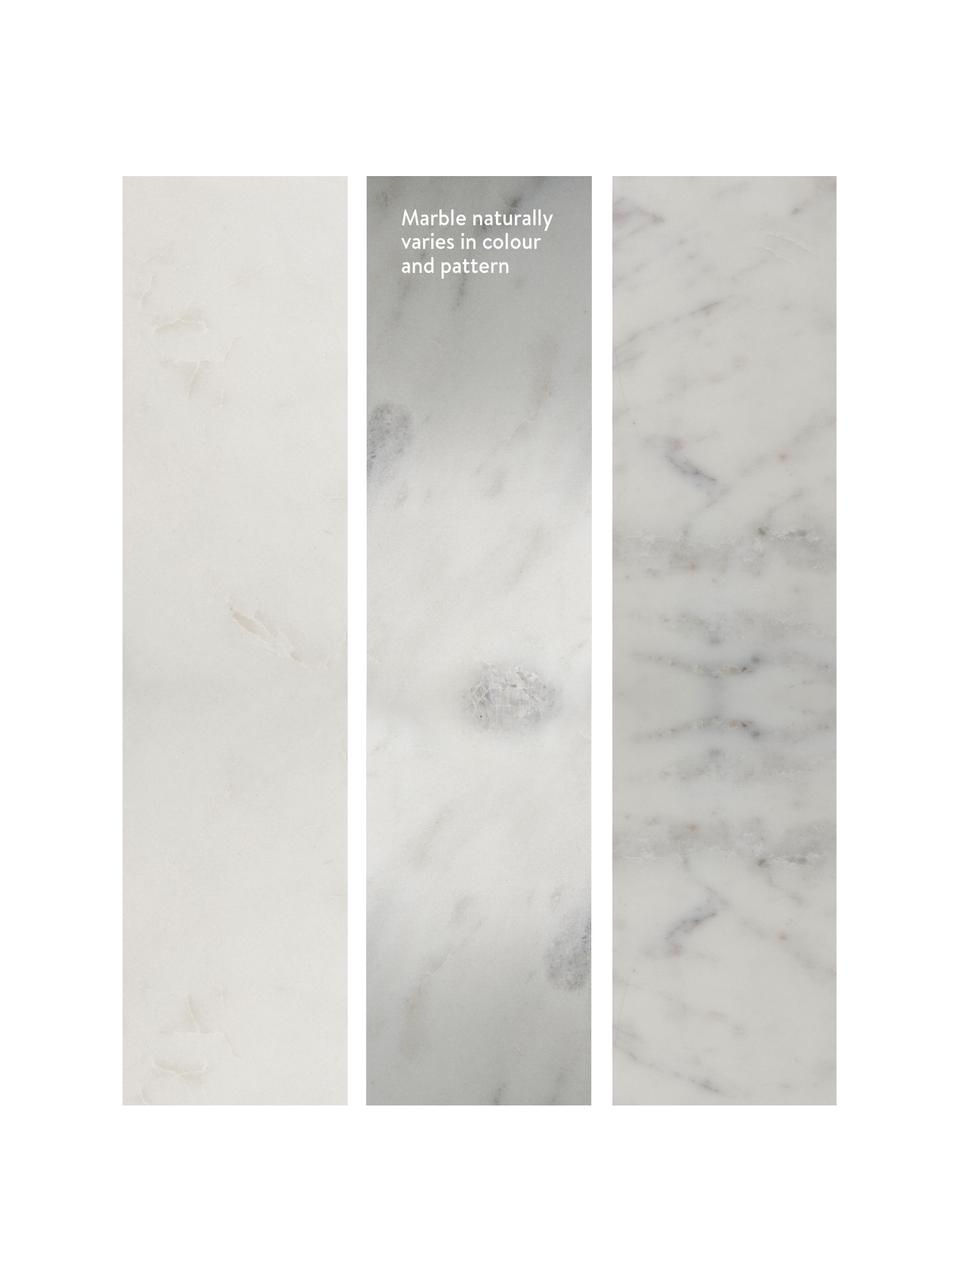 Marmeren salontafel Alys, Tafelblad: marmer, Frame: gecoat metaal, Wit marmer, goudkleurig, B 120 x D 75 cm